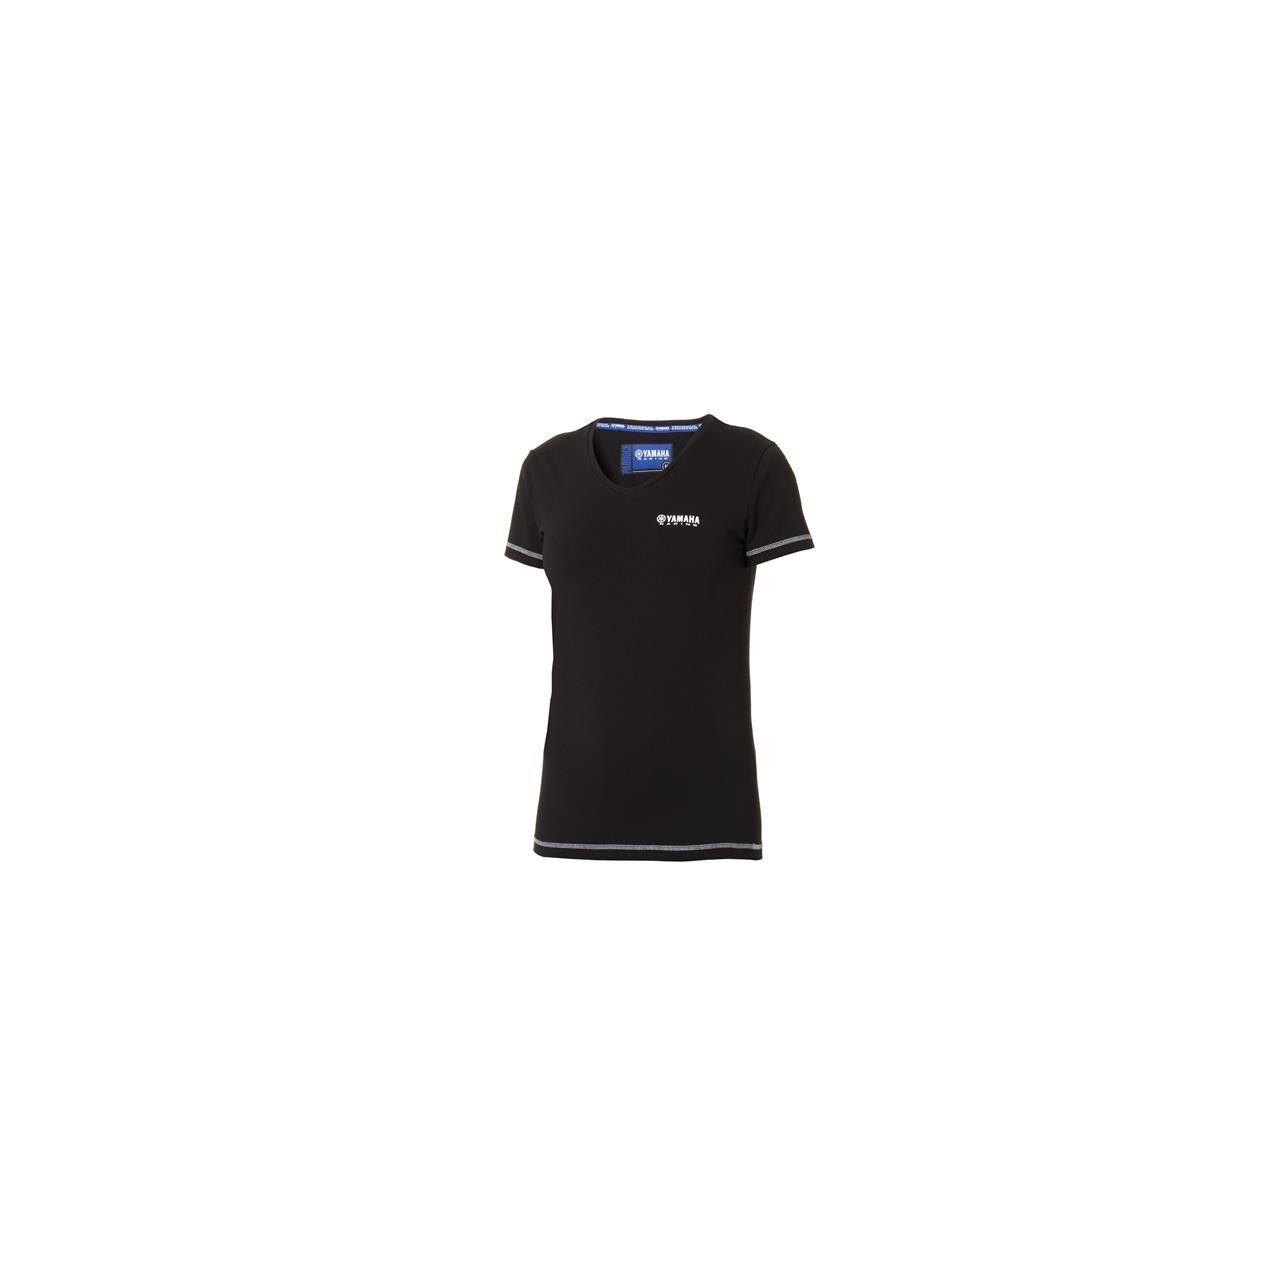 YAMAHA T-shirt femme Paddock 2018